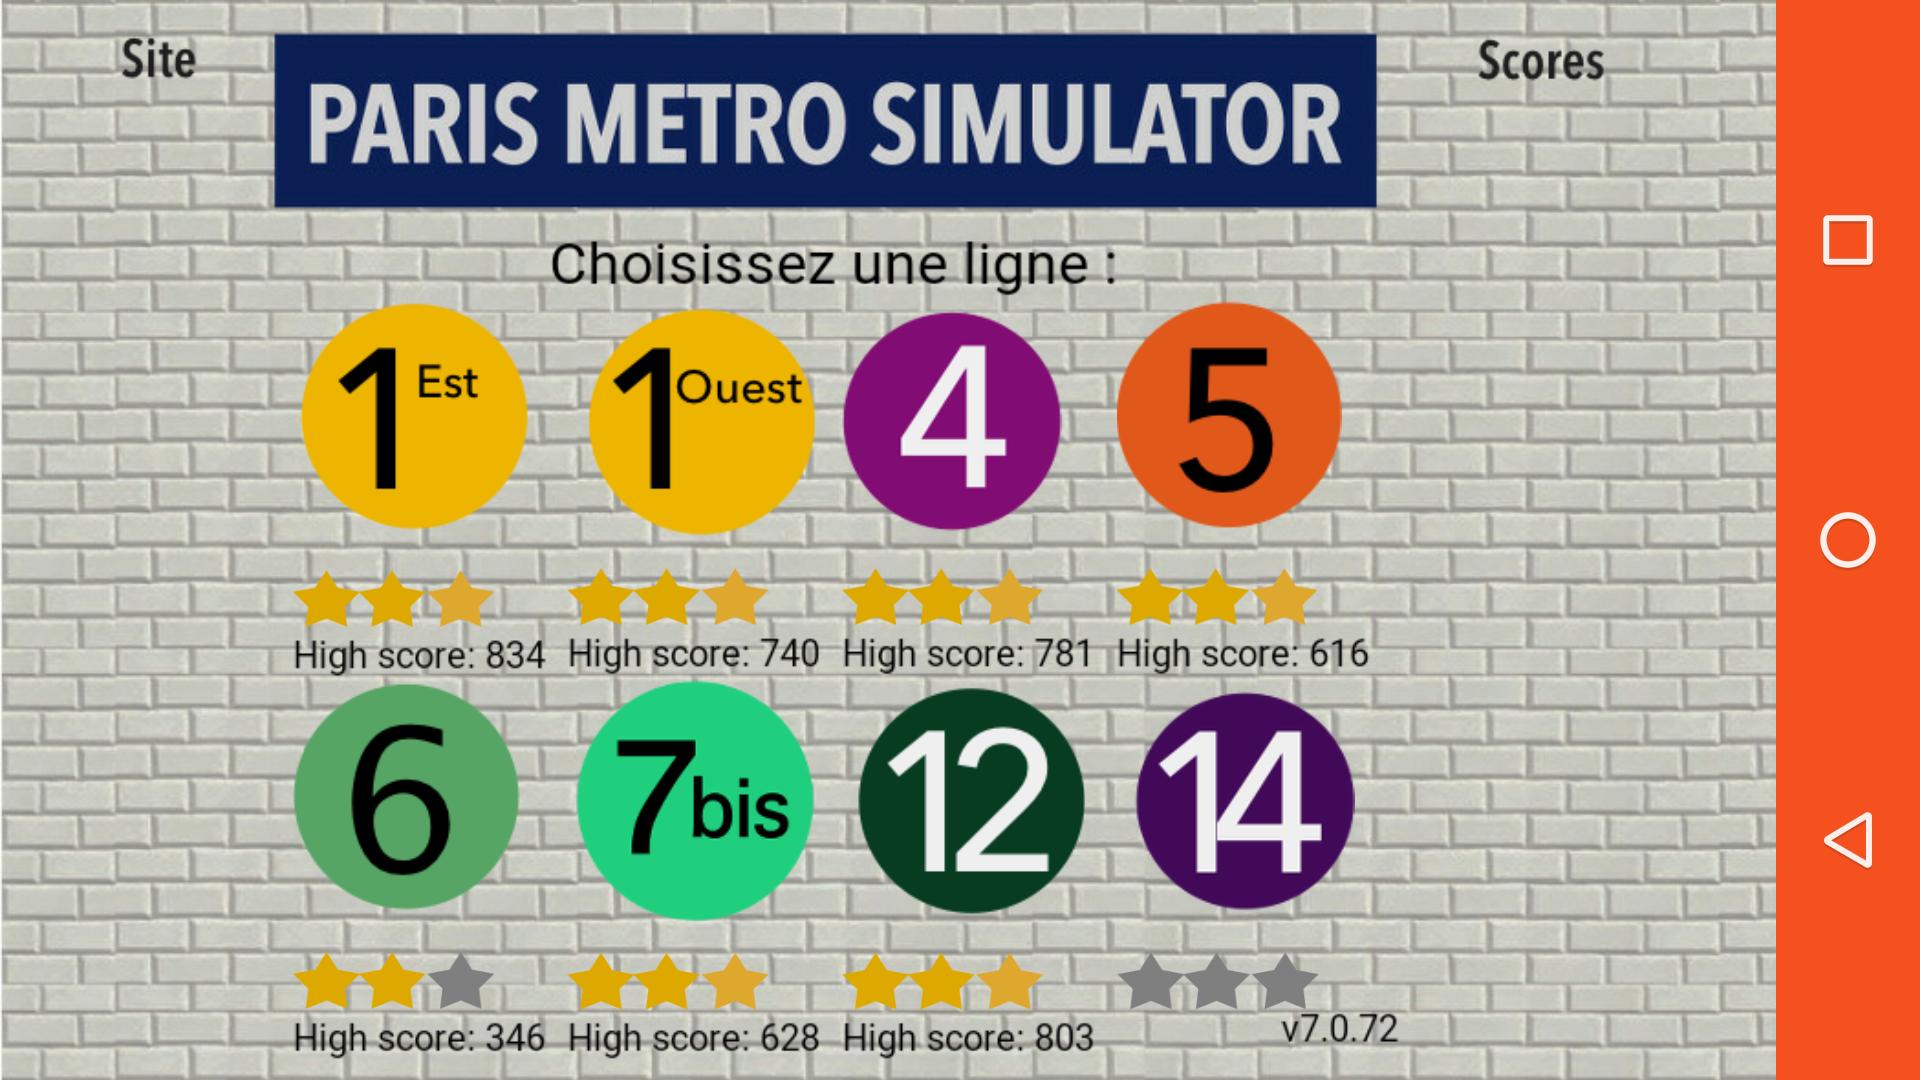 Mantalow: Paris Metro Simulator [Line 7bis] (Android) 628 points on 2016-03-14 05:20:09